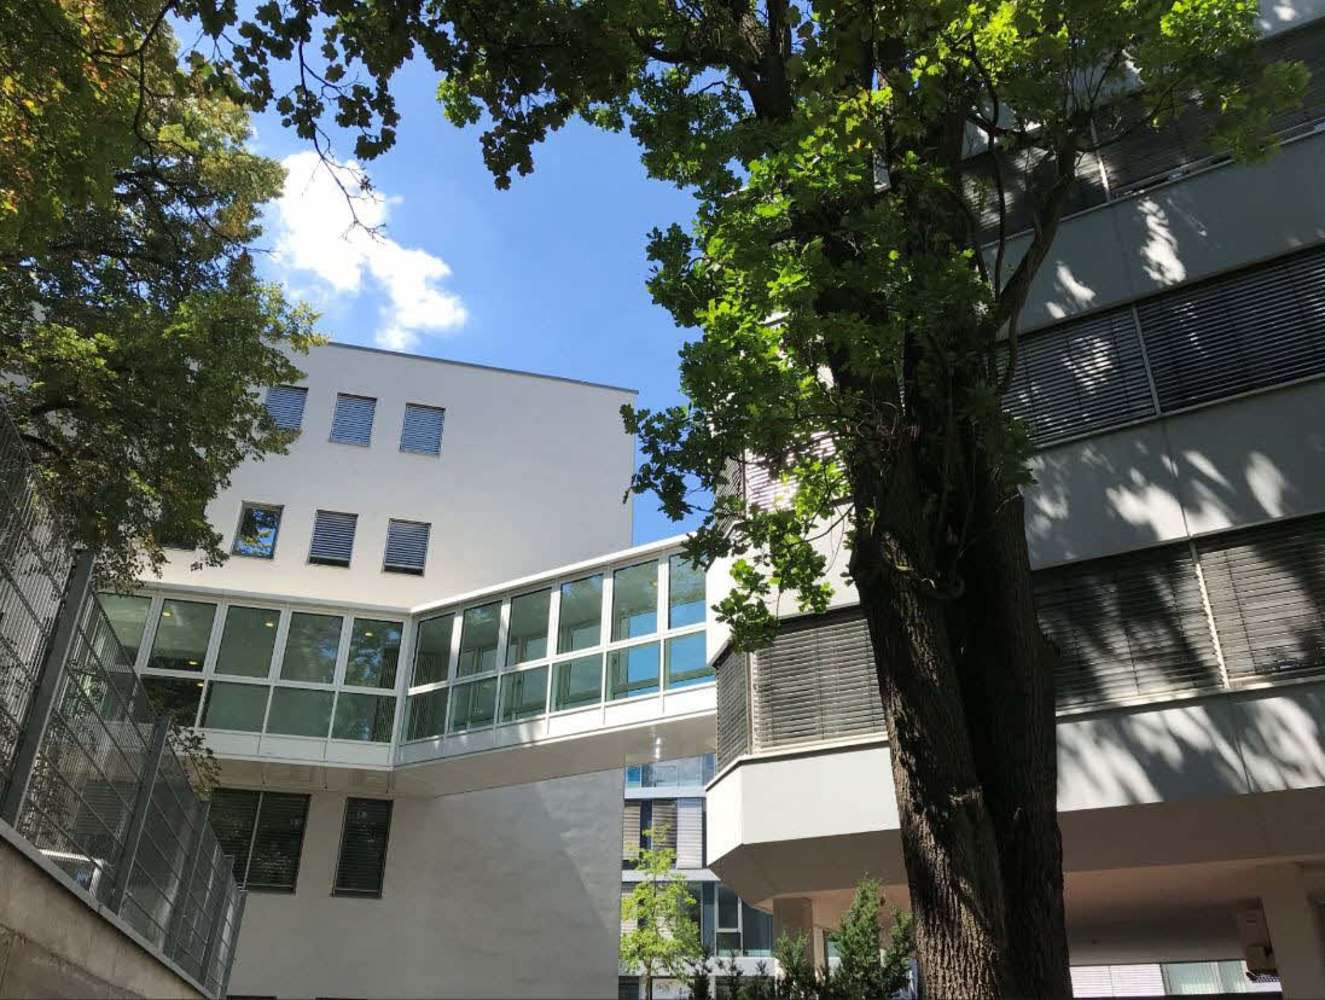 Büros Nürnberg, 90409 - Büro - Nürnberg, Gärten h d Veste - M1628 - 10644774